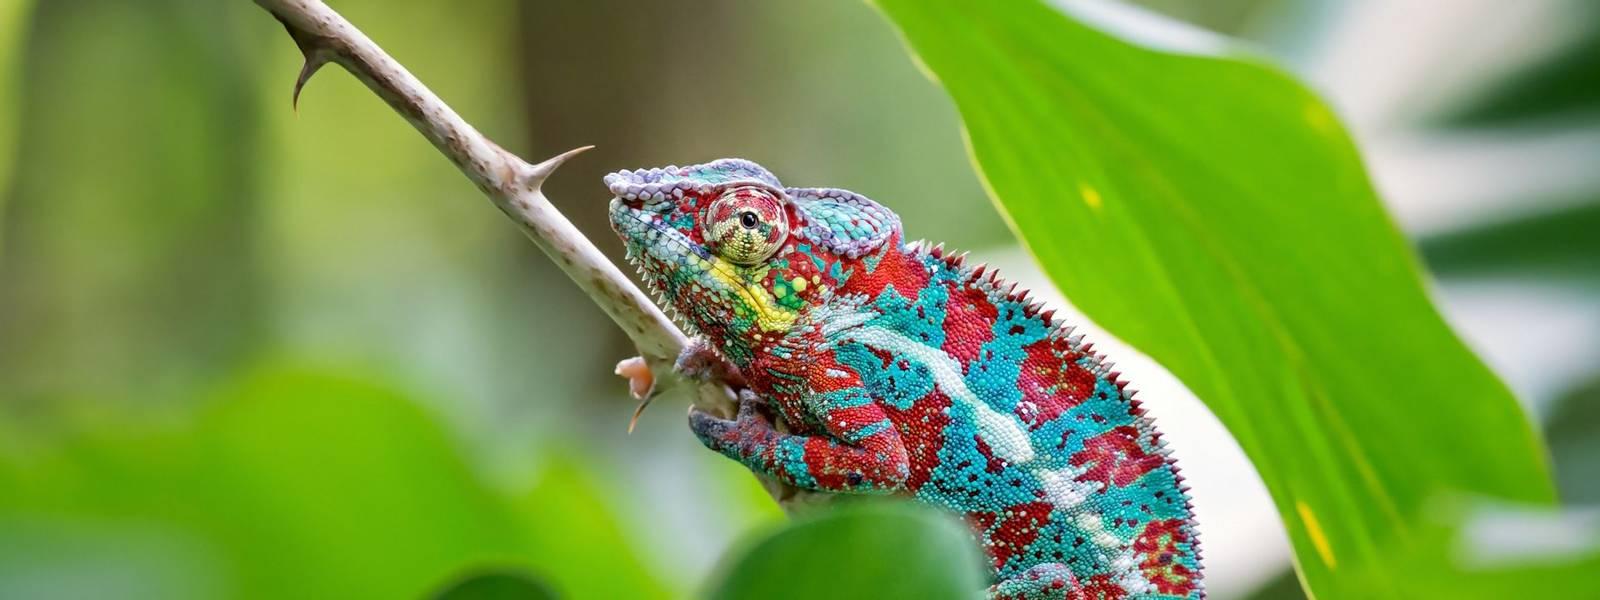 Africa-Madagascar-PantherChameleon-AdobeStock_159028789.jpeg